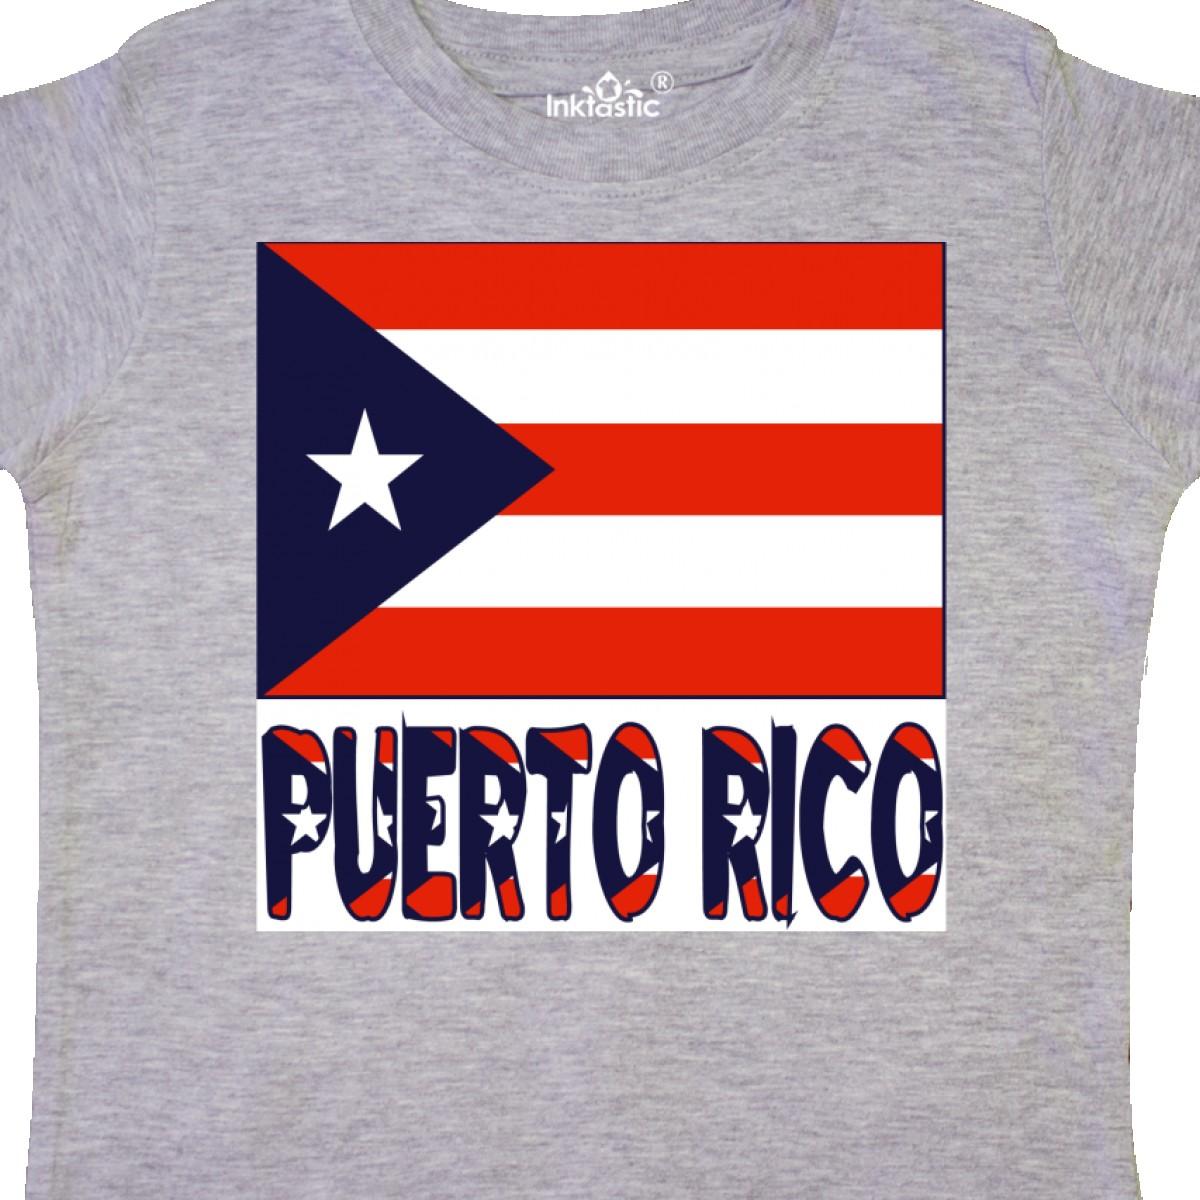 Inktastic-Puerto-Rico-Flag-amp-Name-Toddler-T-Shirt-Puerto-rican-Puerto-rico-Gift thumbnail 6